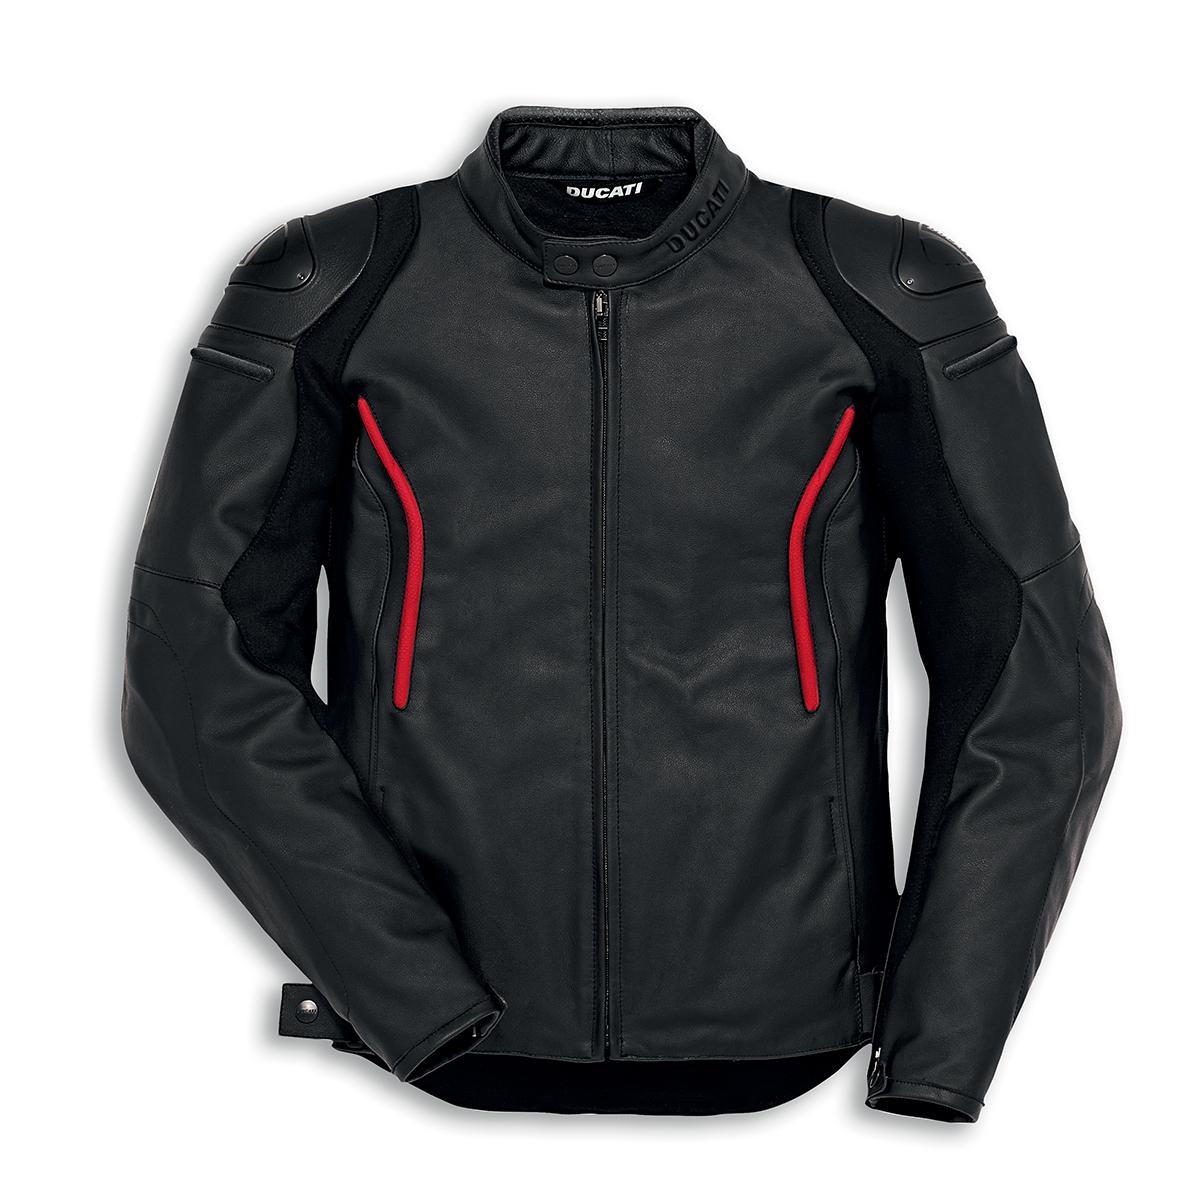 Ducati Stealth C Leather Jacket